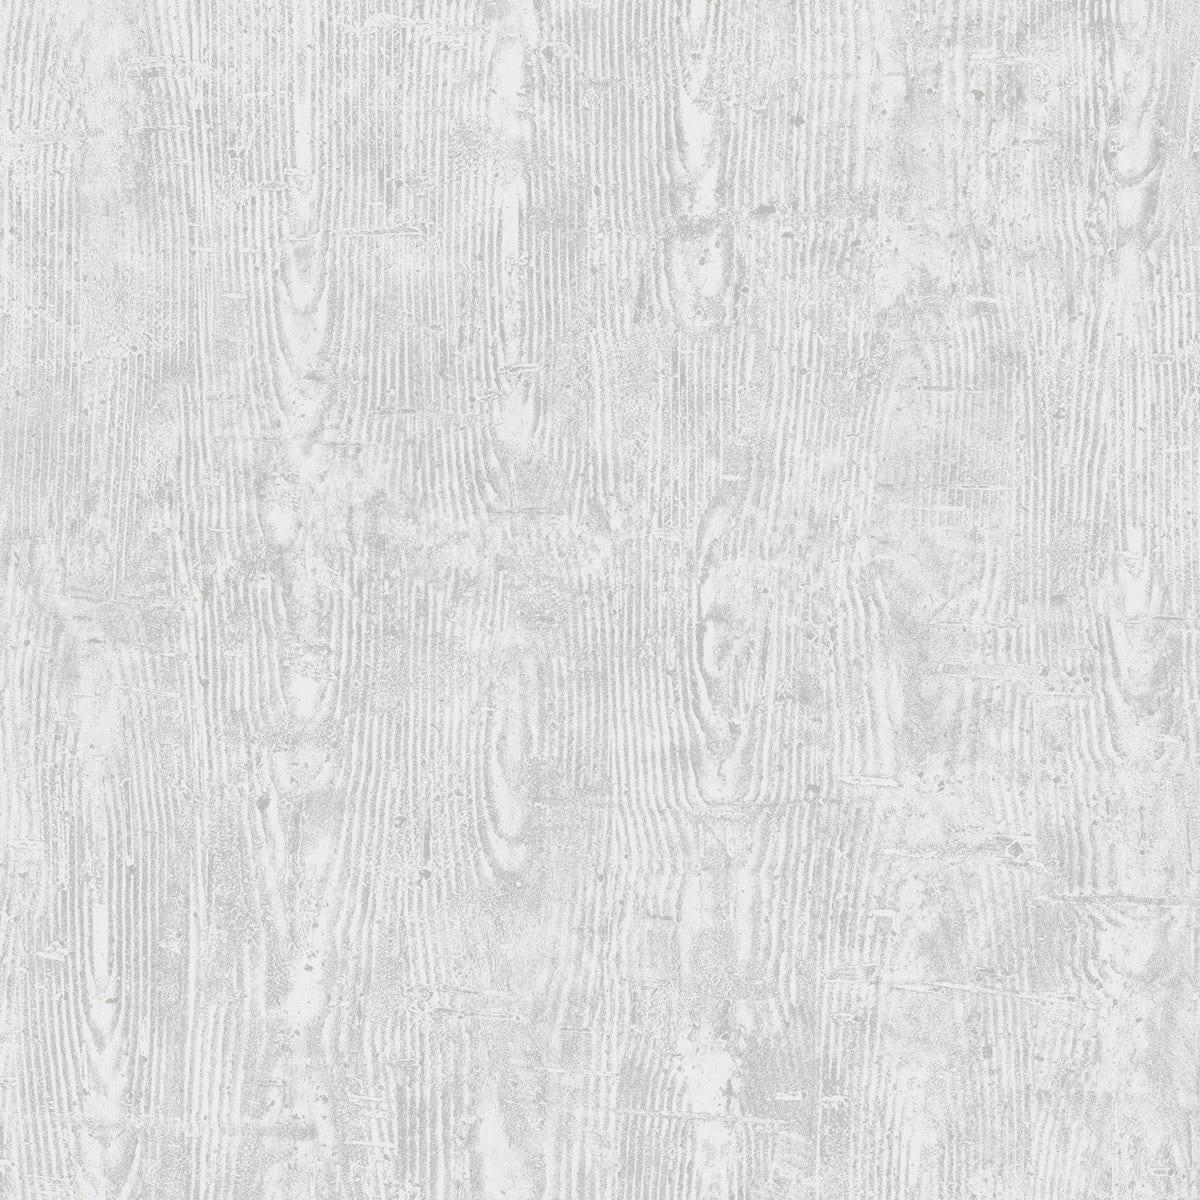 Graham & Brown Driftwood dove grey wallpaper